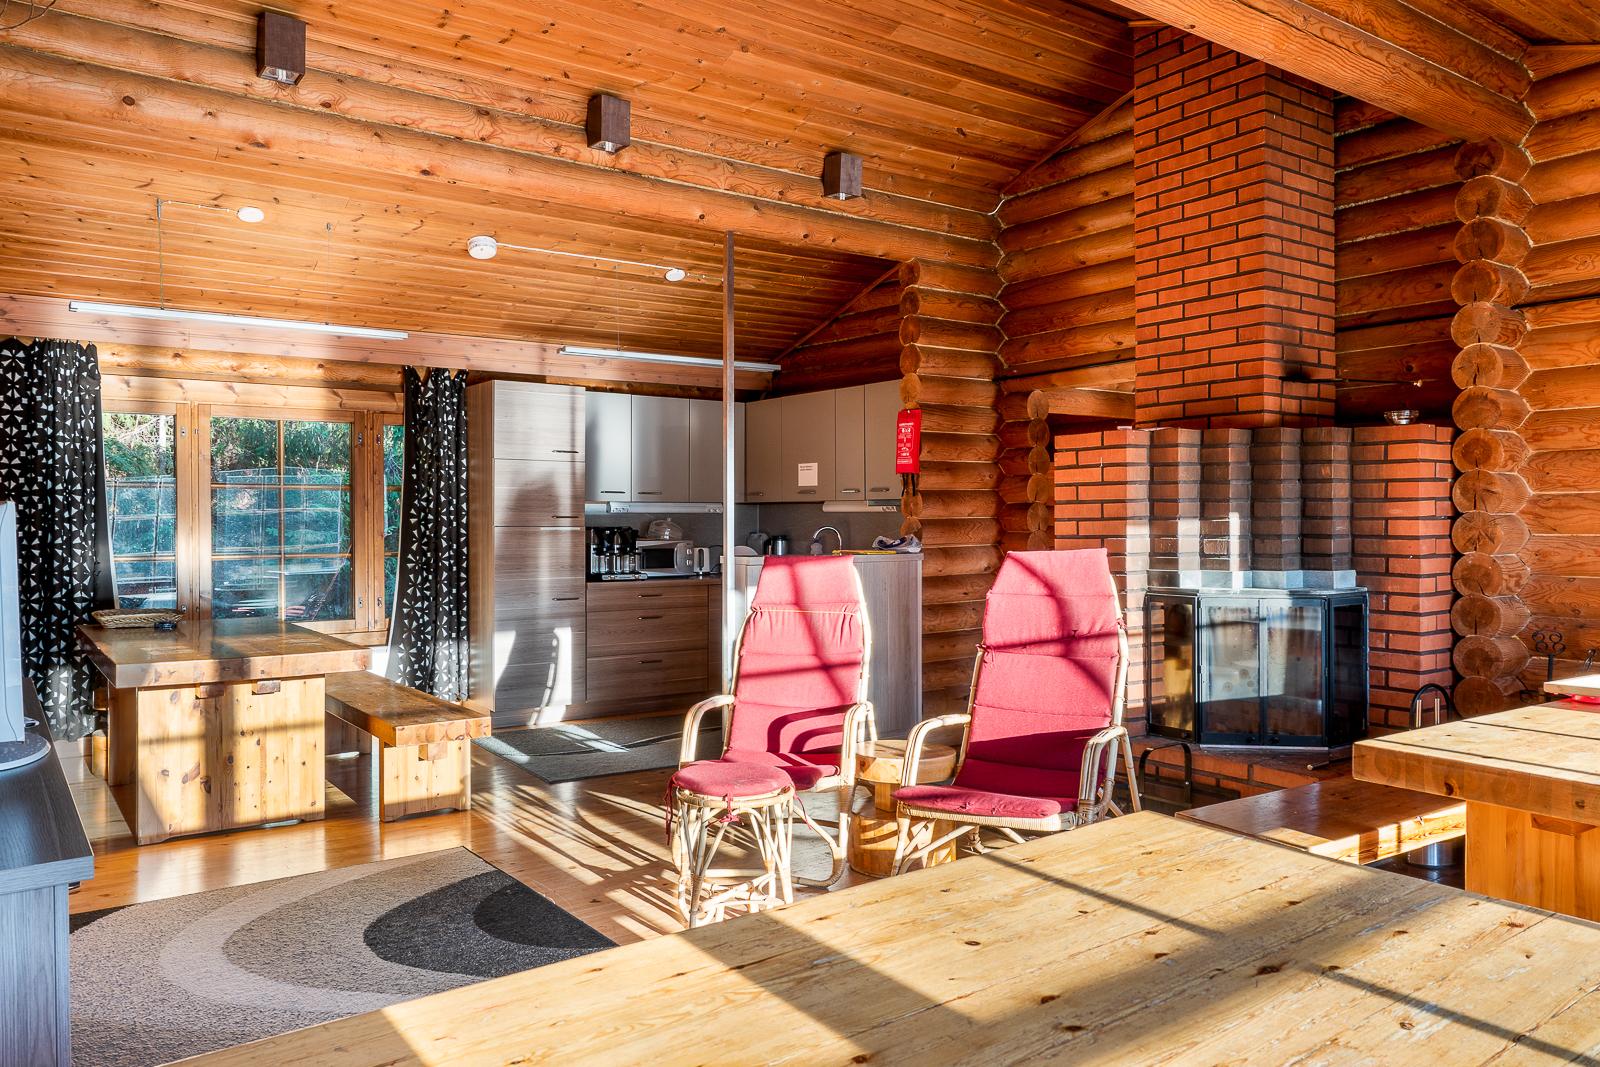 Mökkikylän sauna title=